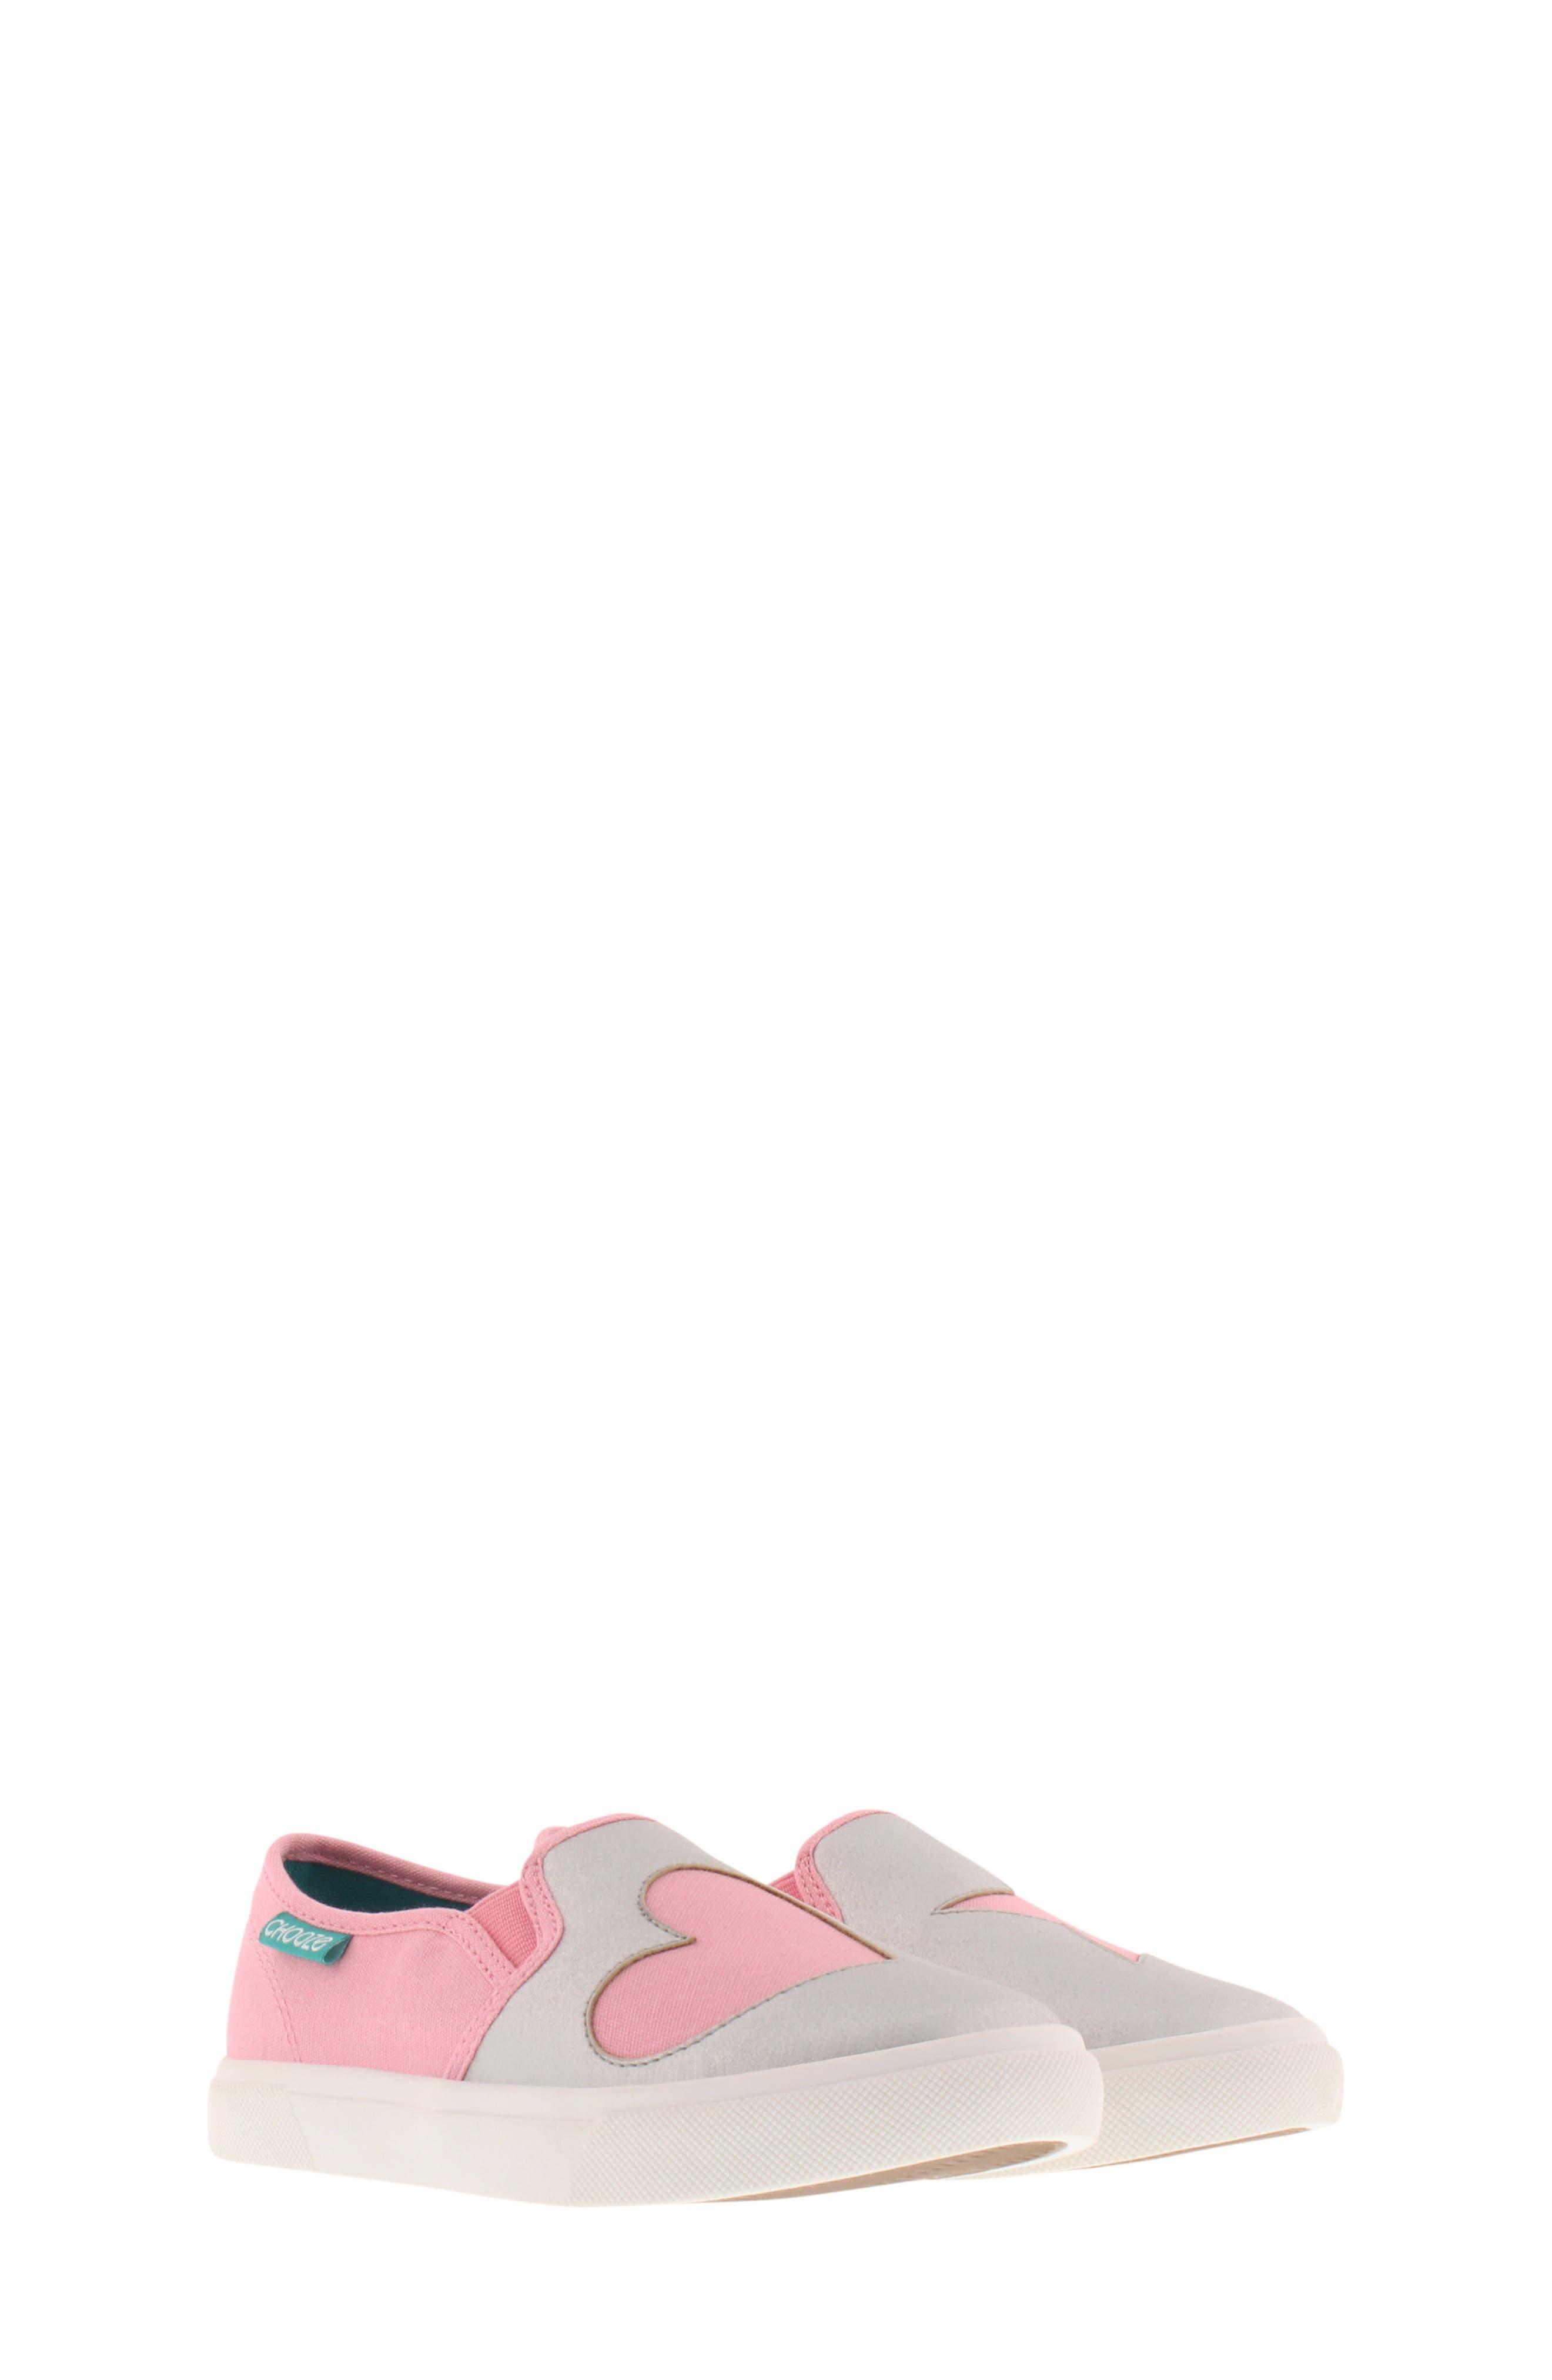 CHOOZE, Little Choice Starheart Slip-On Sneaker, Main thumbnail 1, color, SILVER